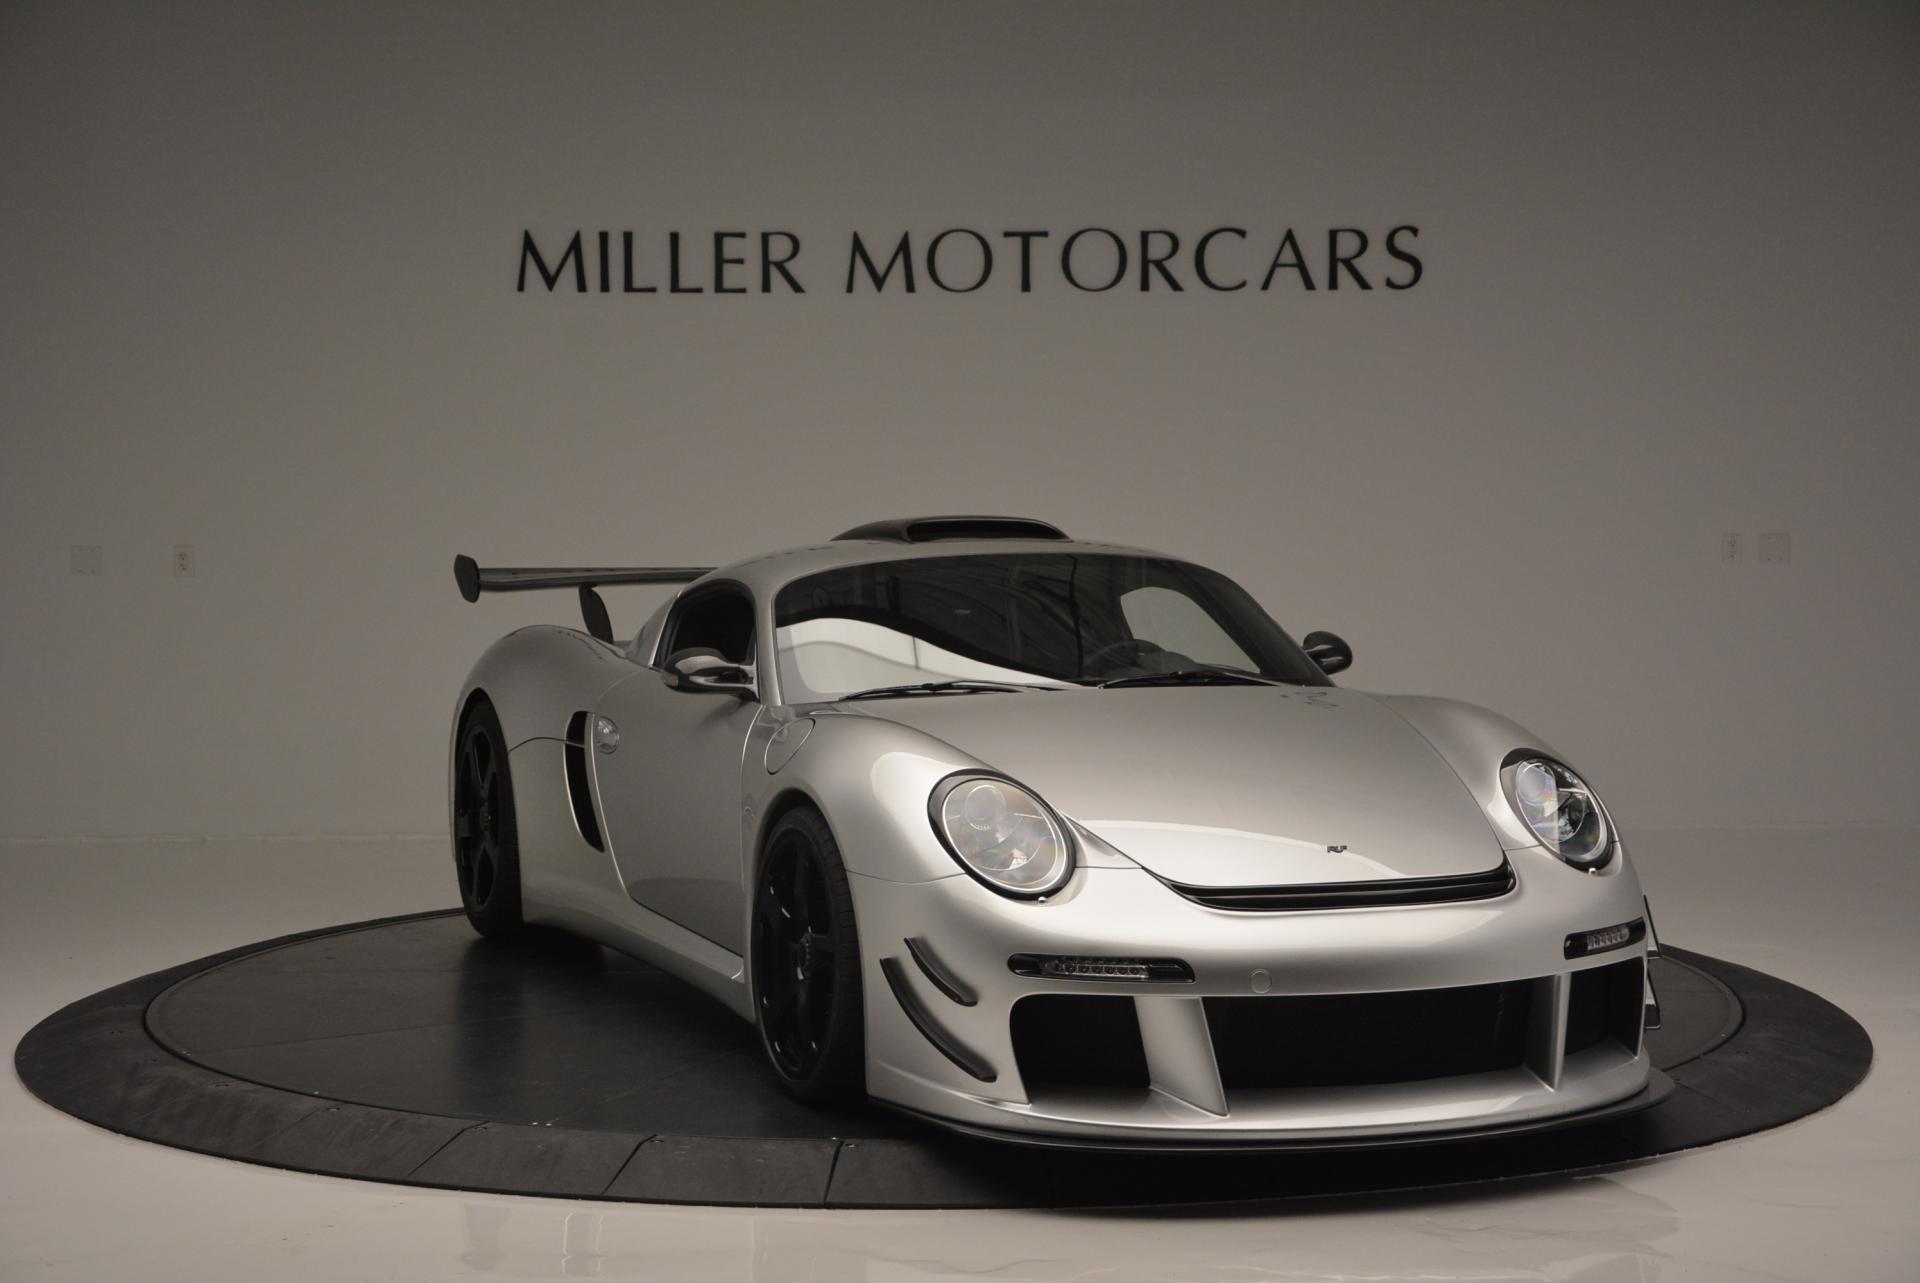 Used 2012 Porsche RUF CTR-3 Clubsport For Sale In Westport, CT 110_p14